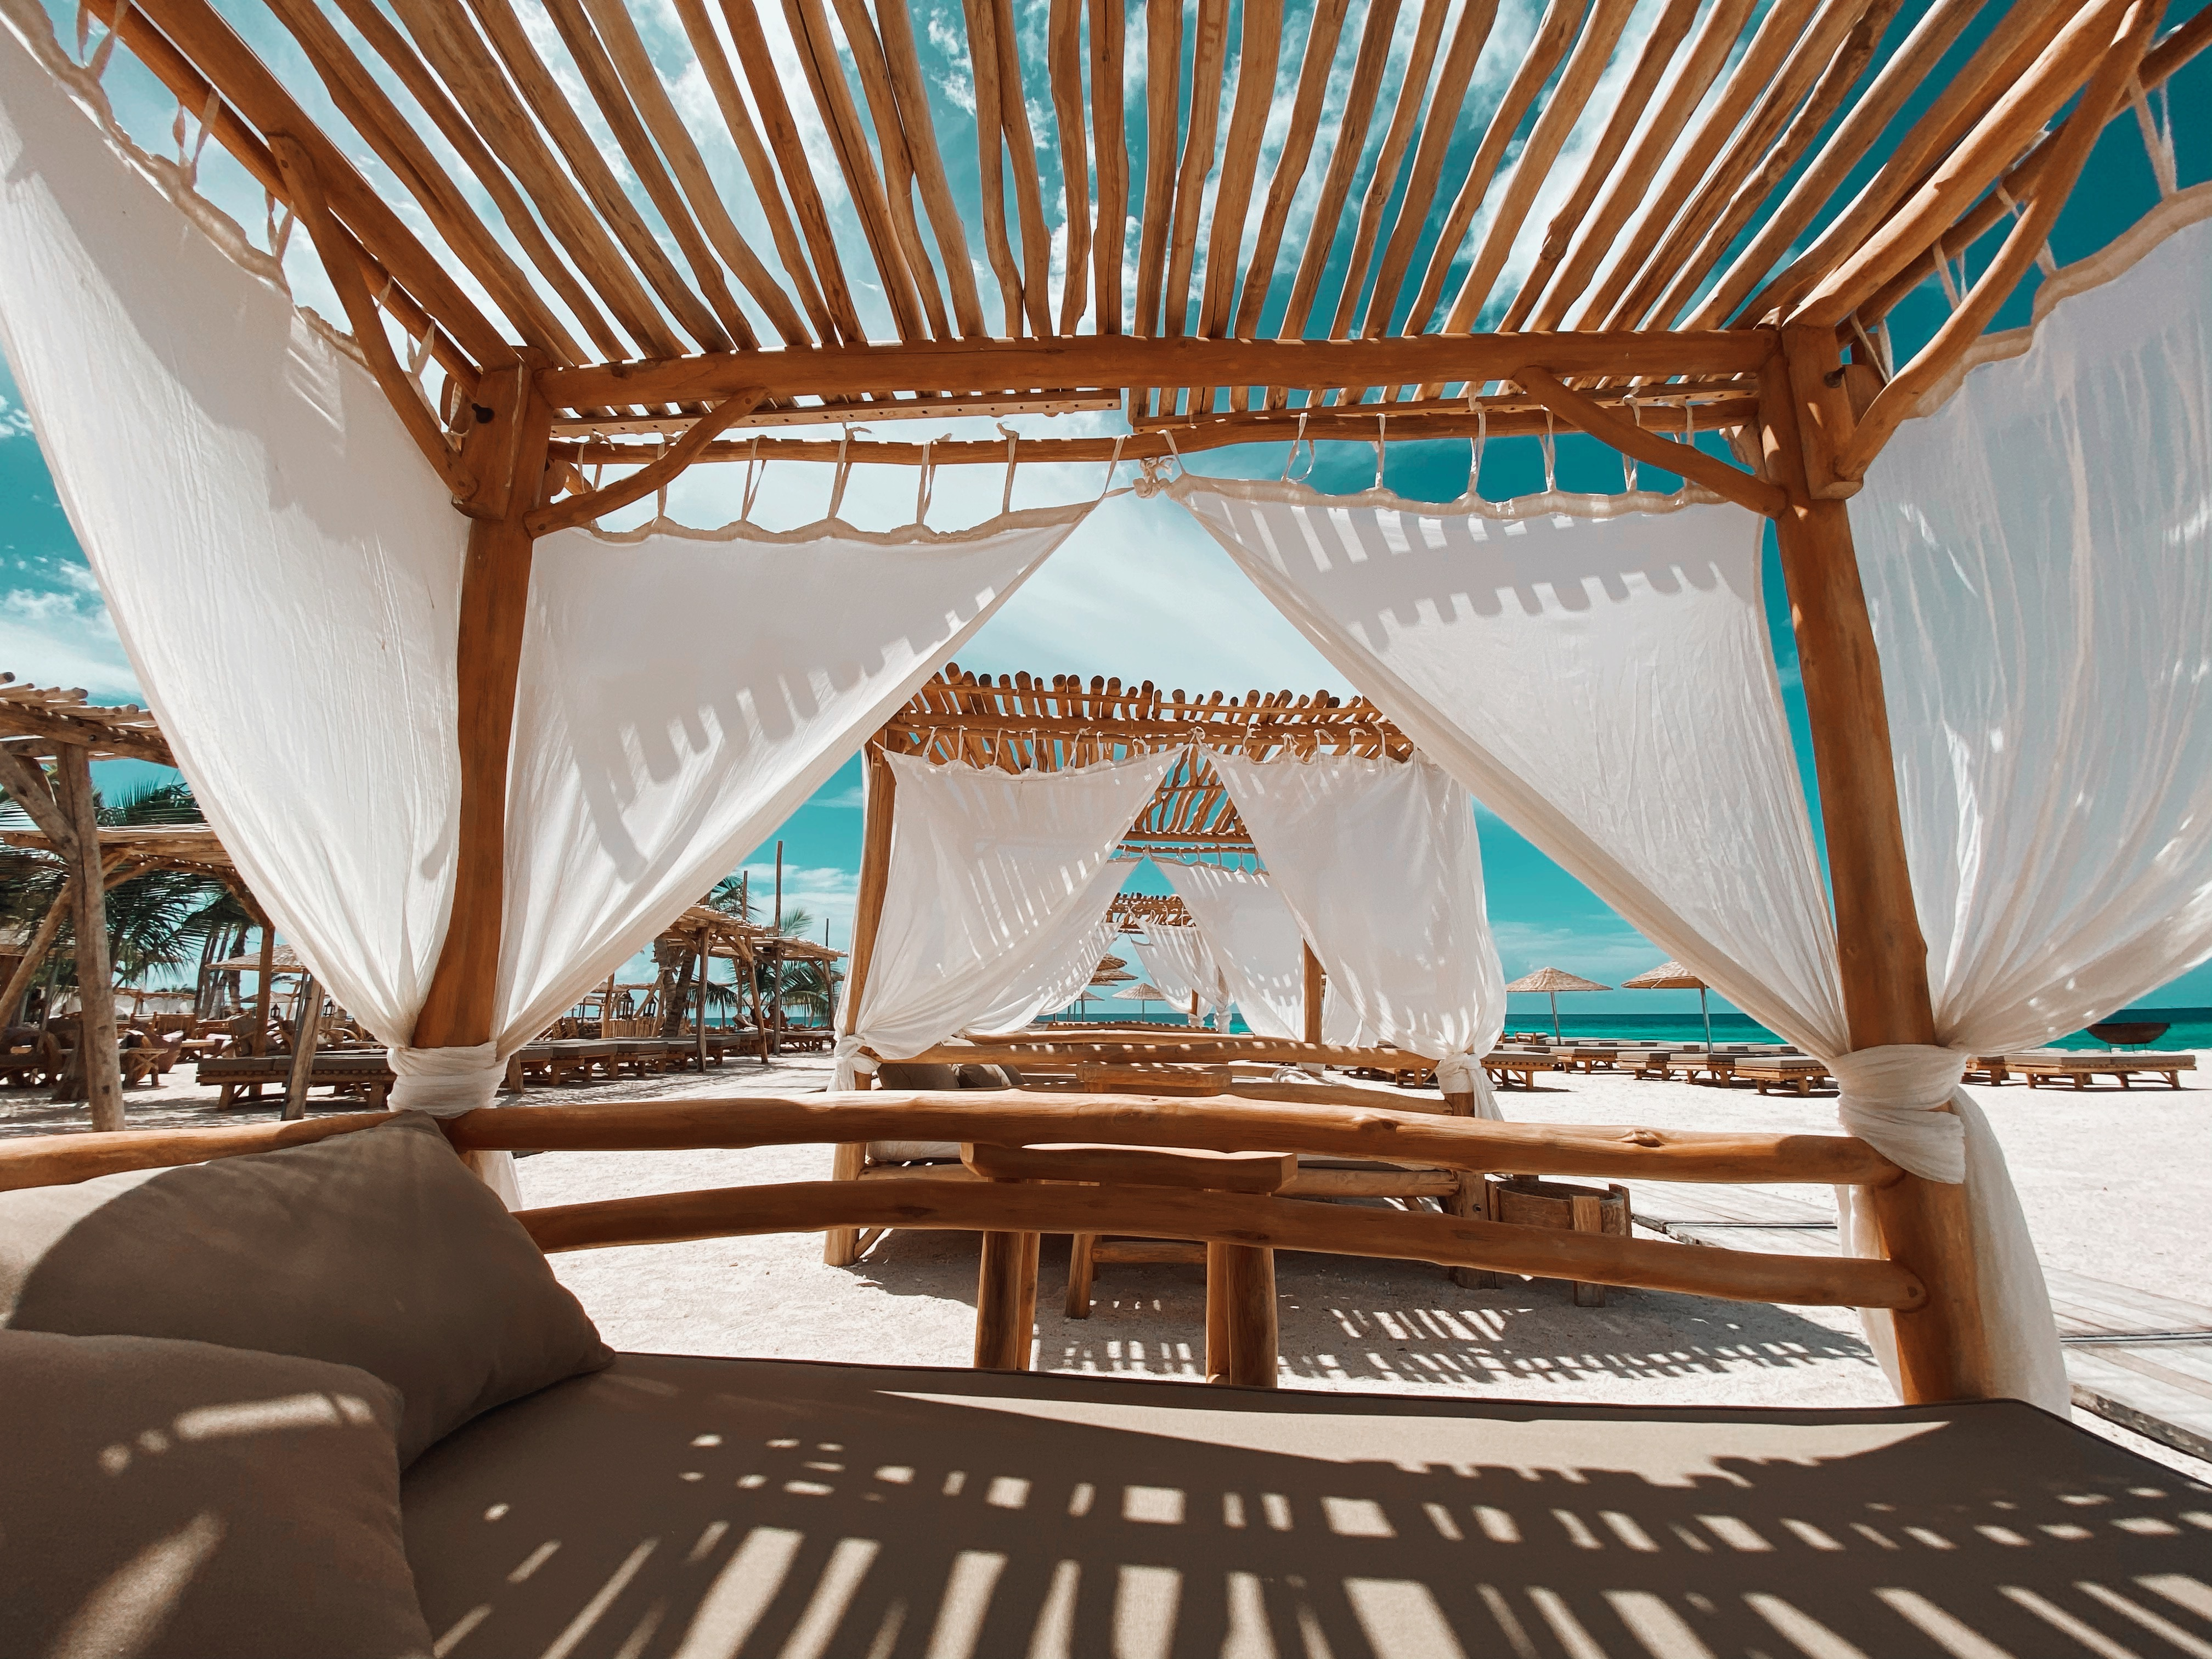 Cabana vibes at Ocean Oasis